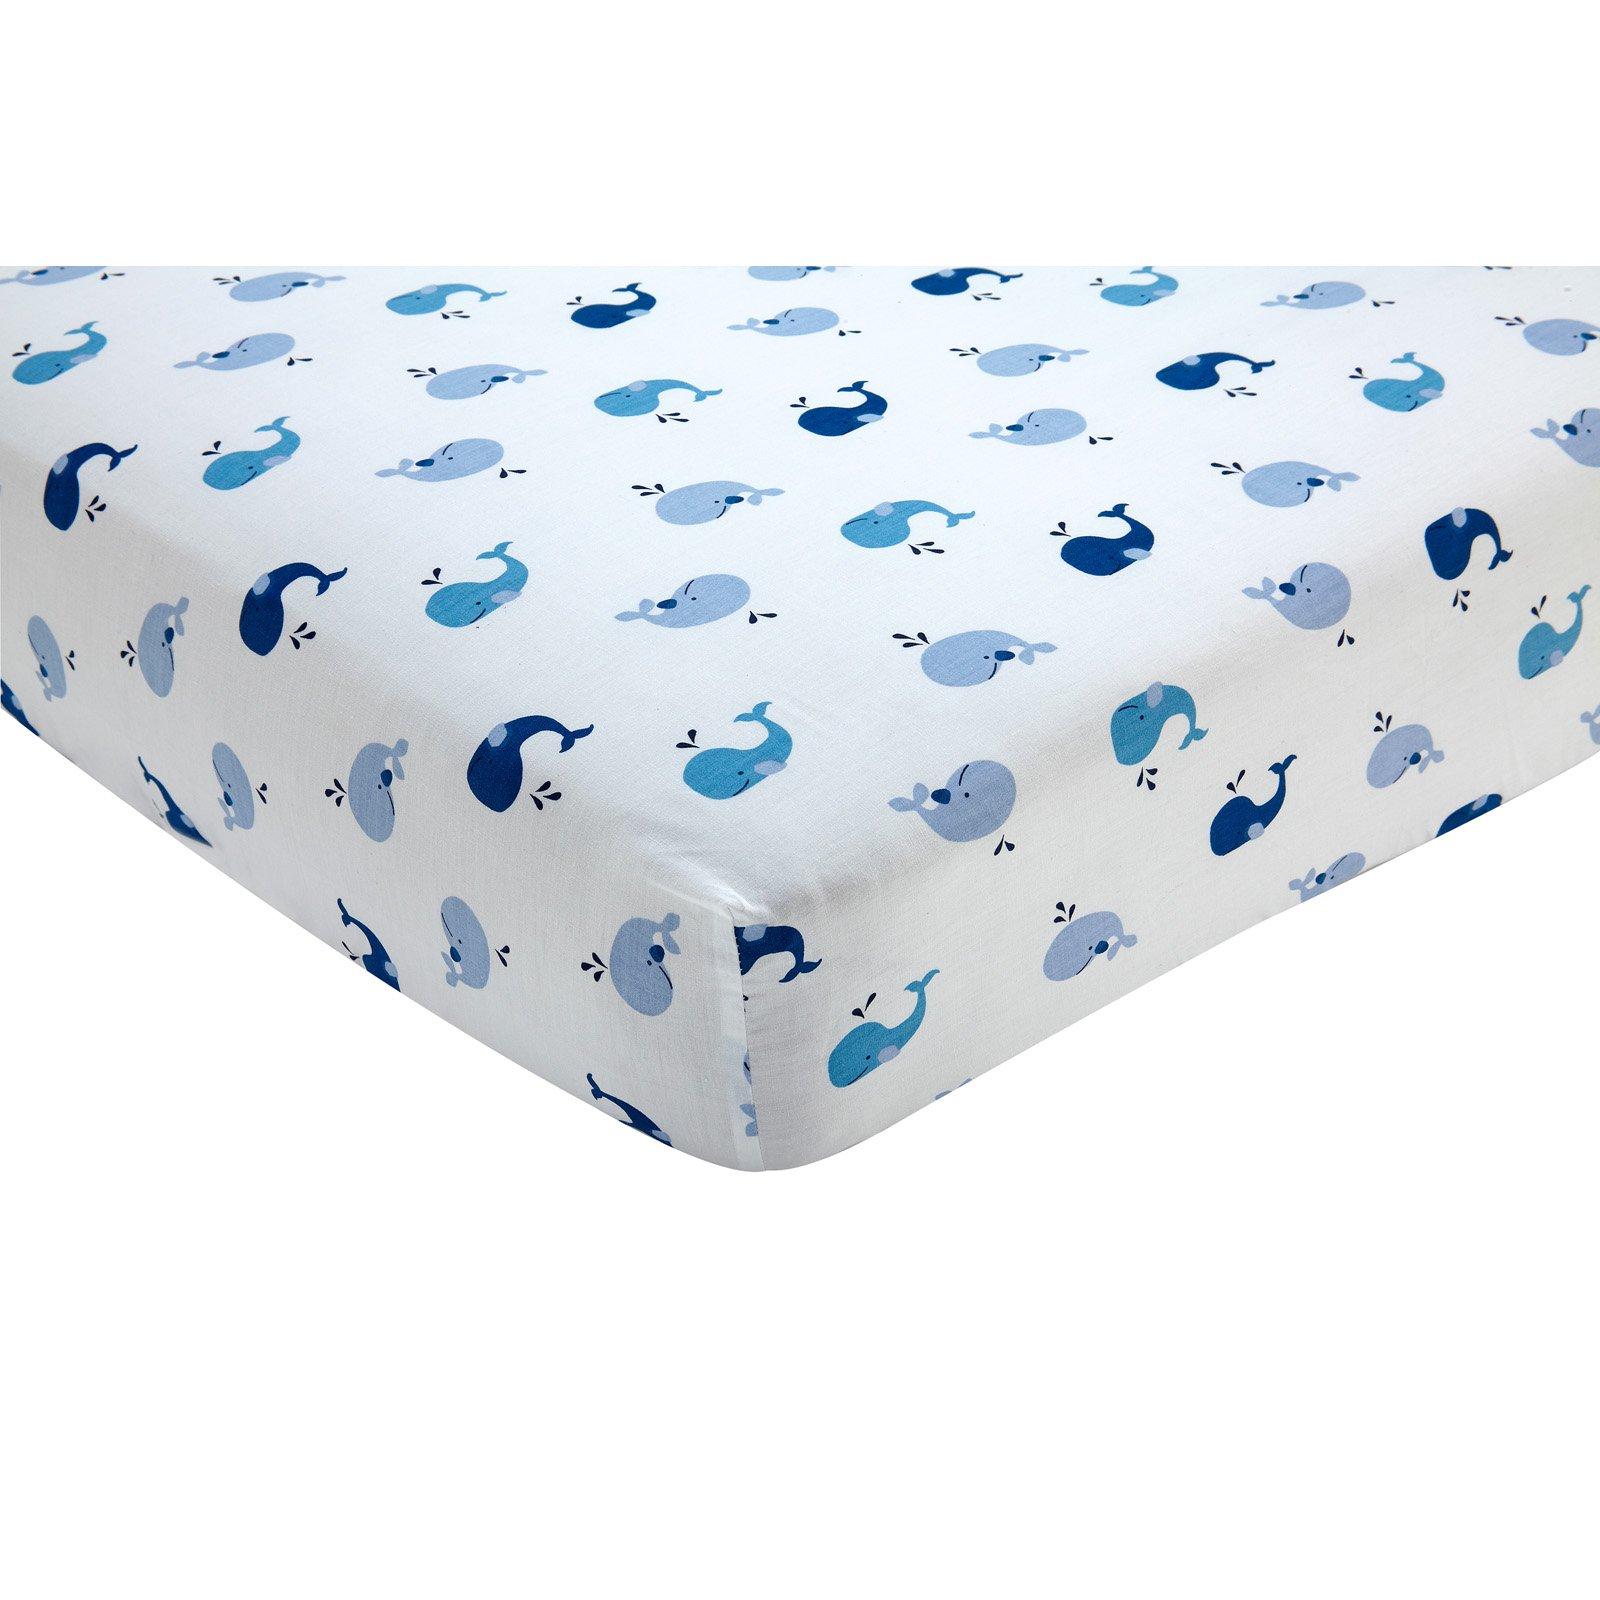 Brody Nautical Whale Fitted Crib Sheet By Nautica Kids Walmartcom